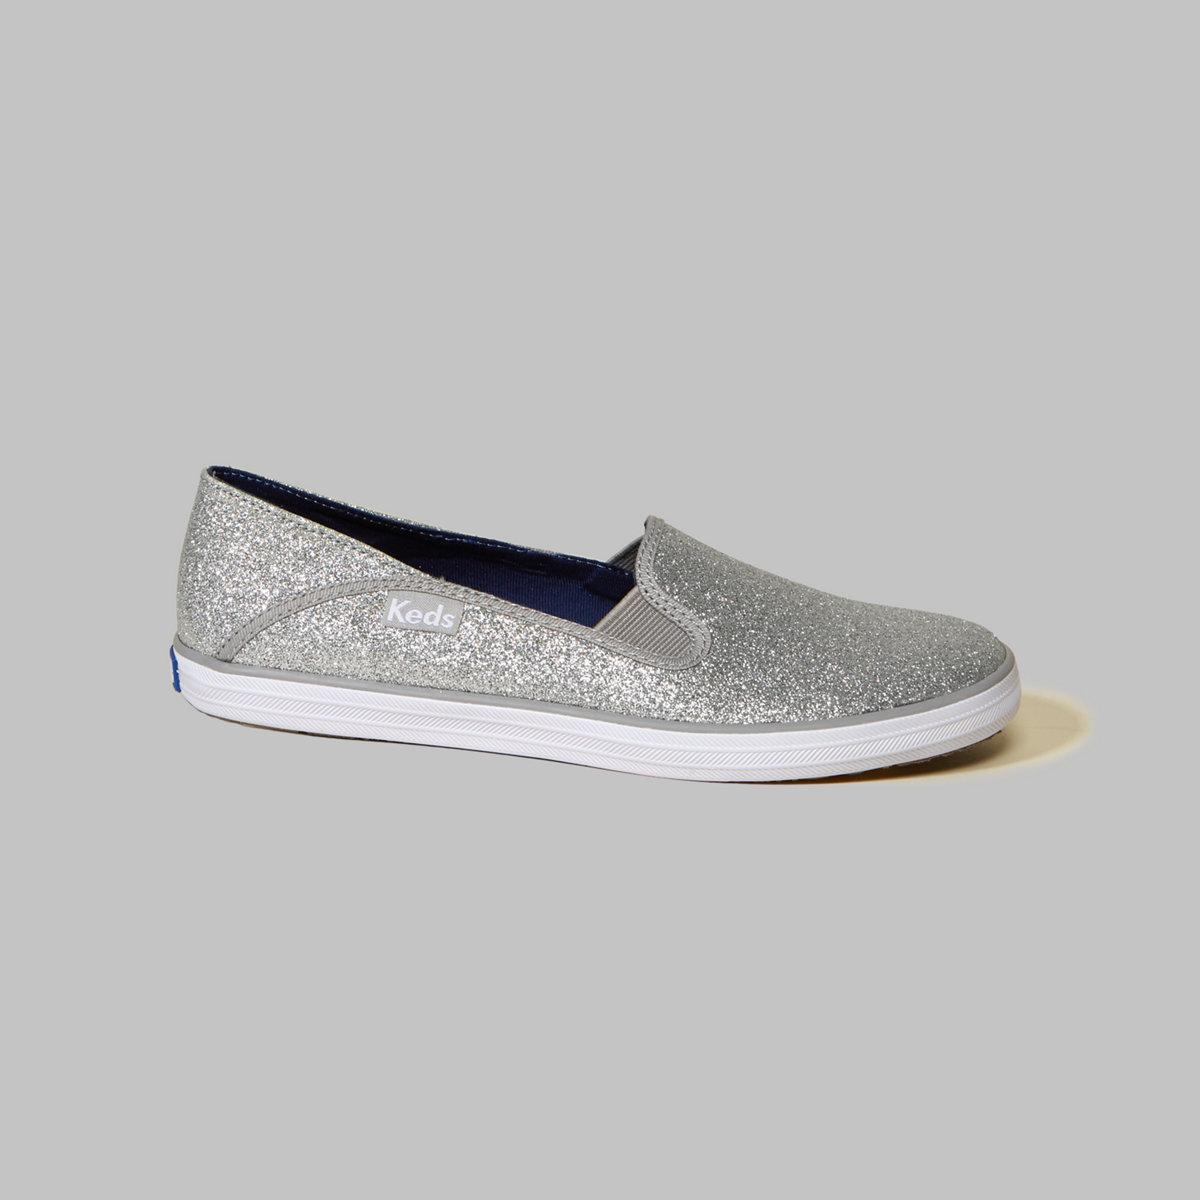 Hollister + Keds Crashback Glitter Sneakers